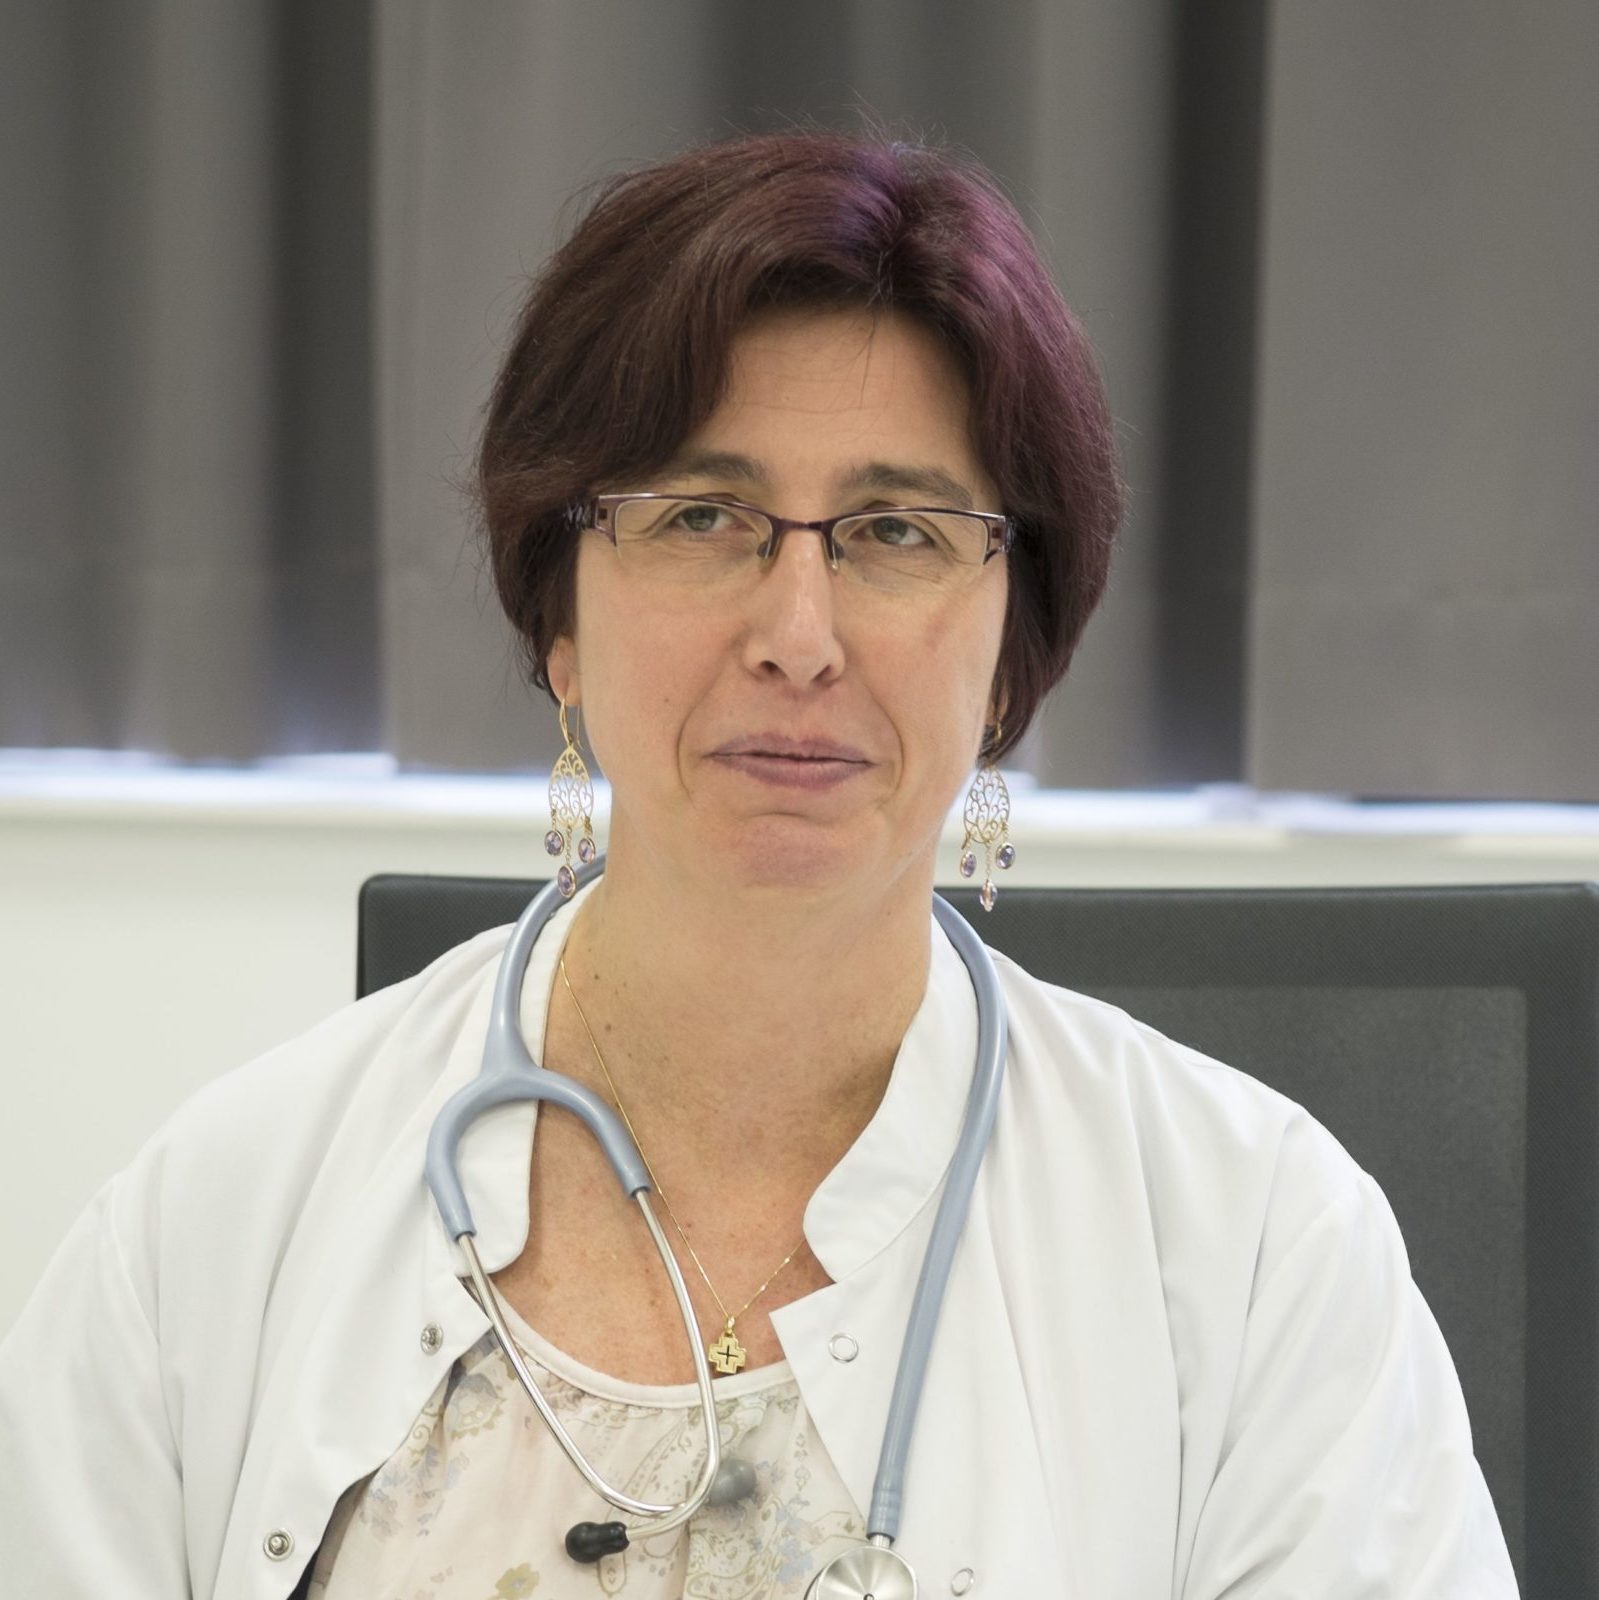 Dr Laurence Kiehm